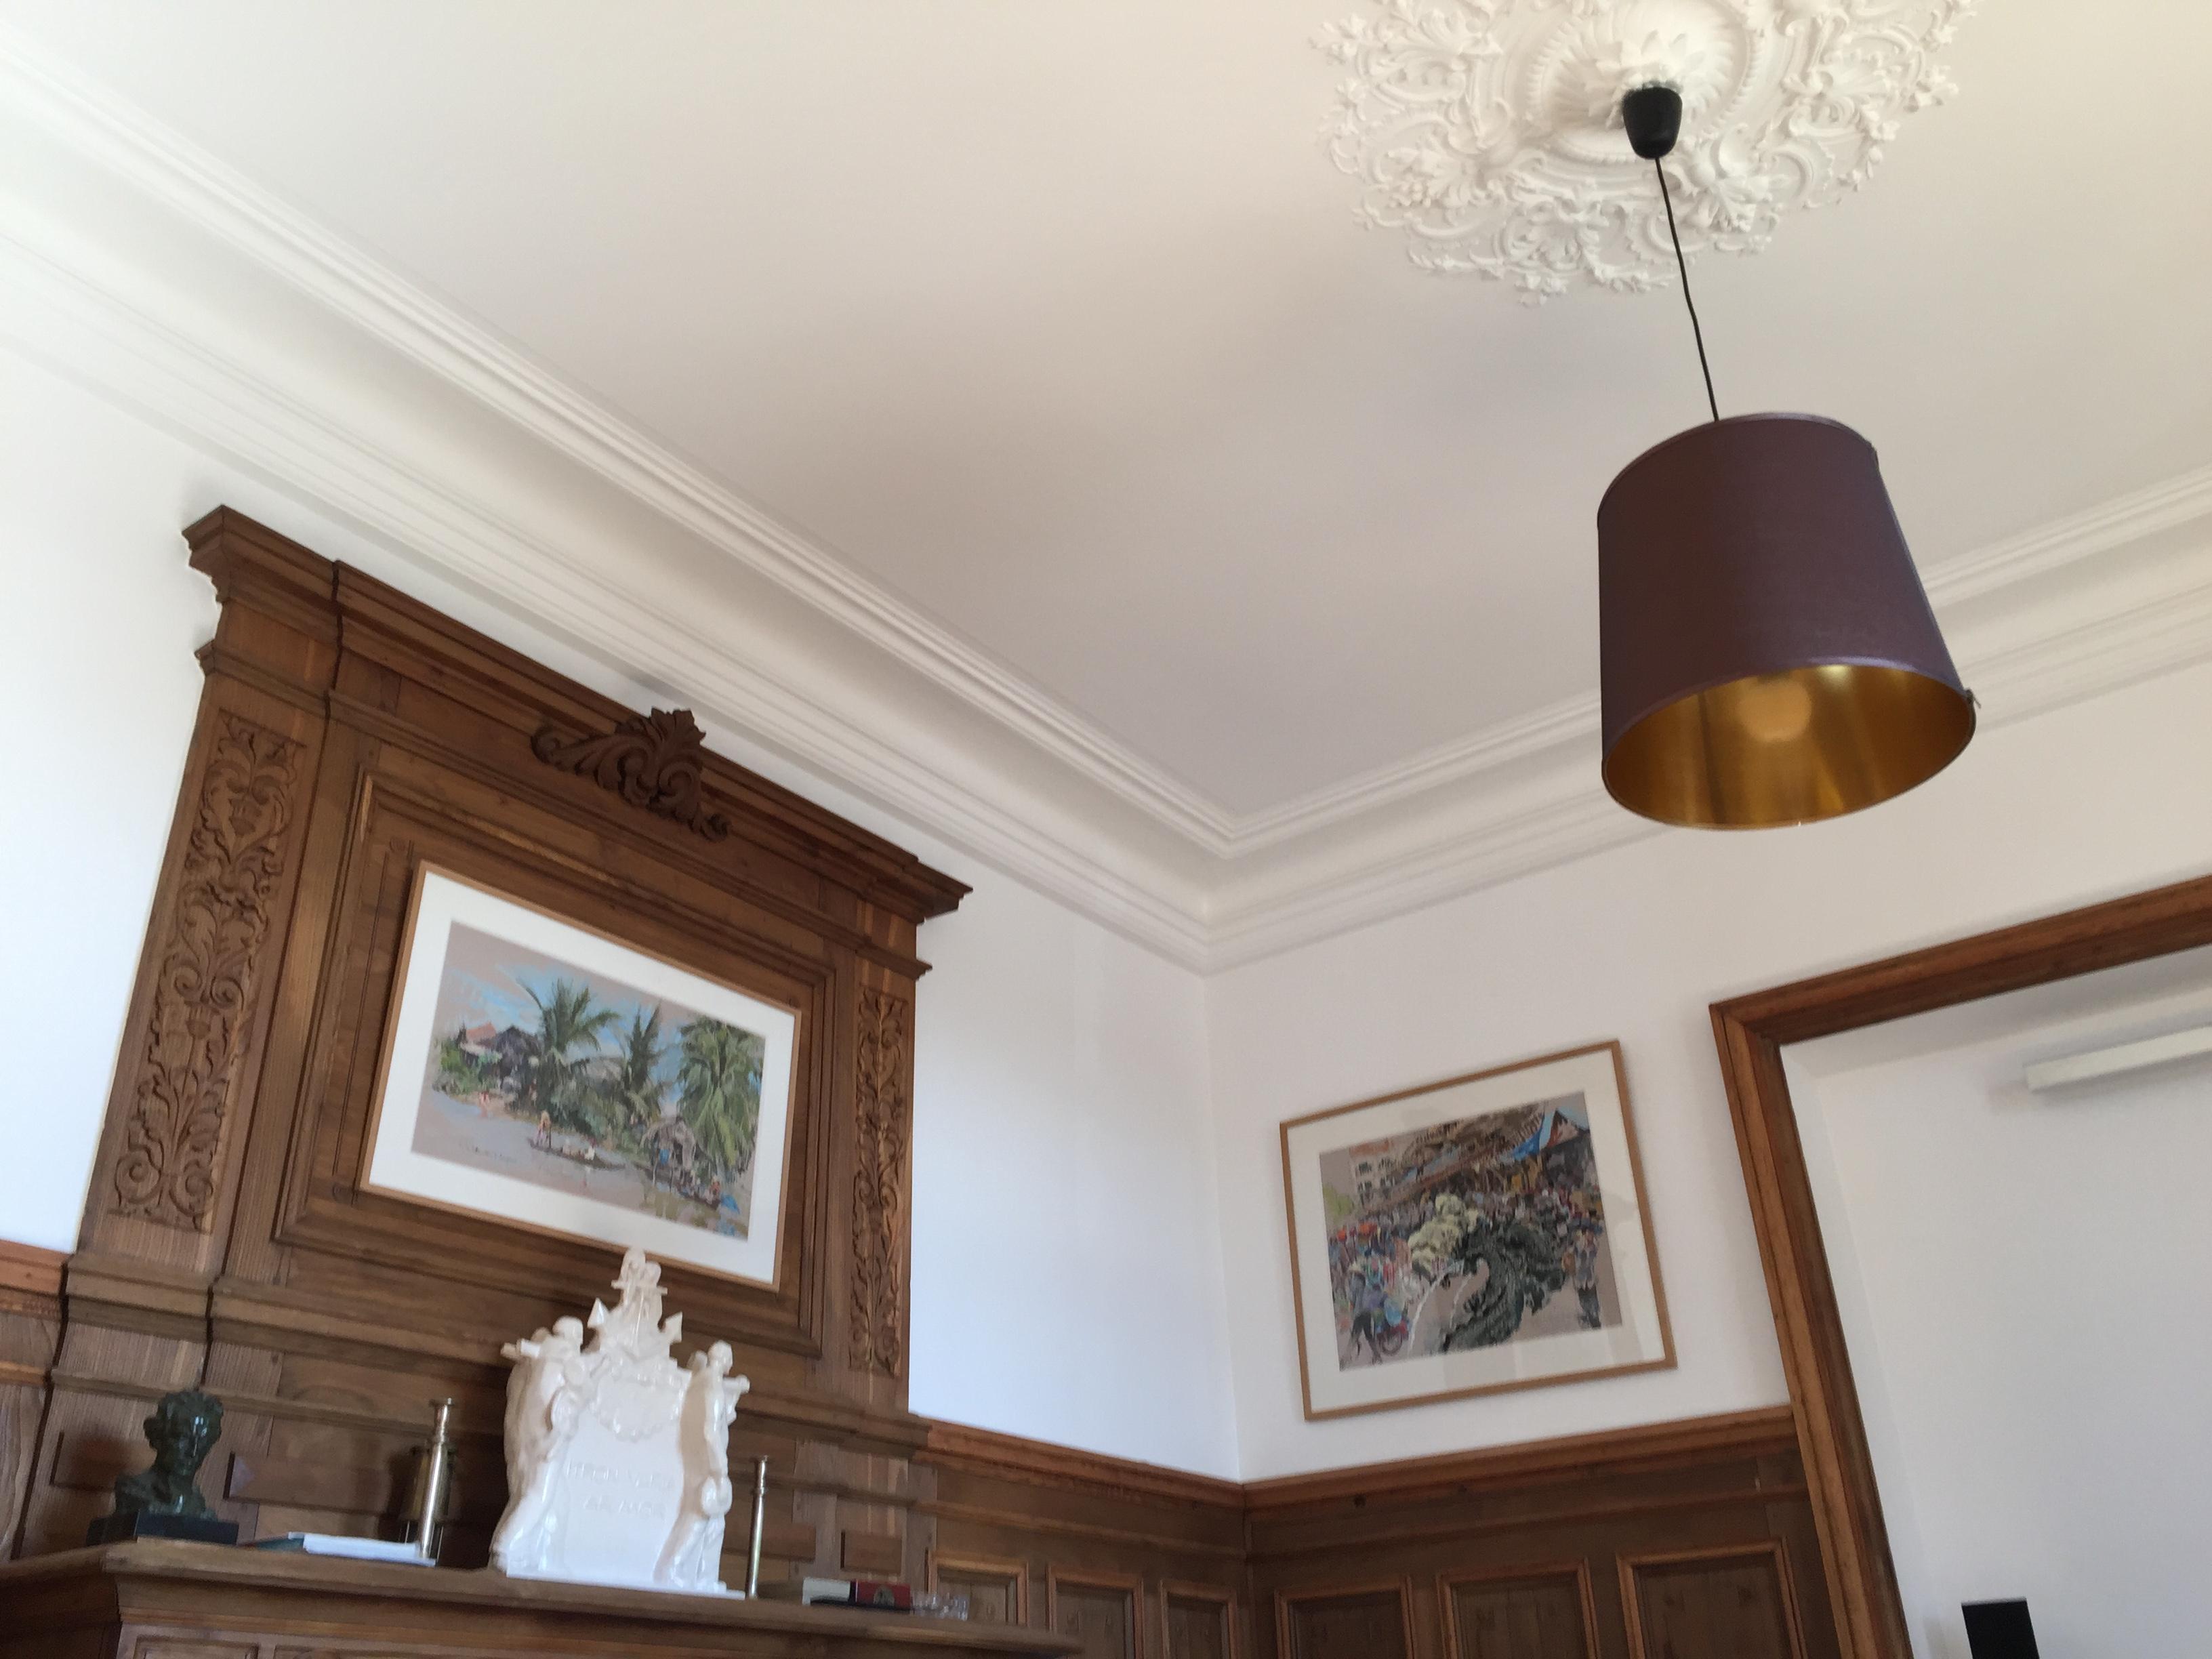 renovation plafond toile de verre revtement de rnovation. Black Bedroom Furniture Sets. Home Design Ideas